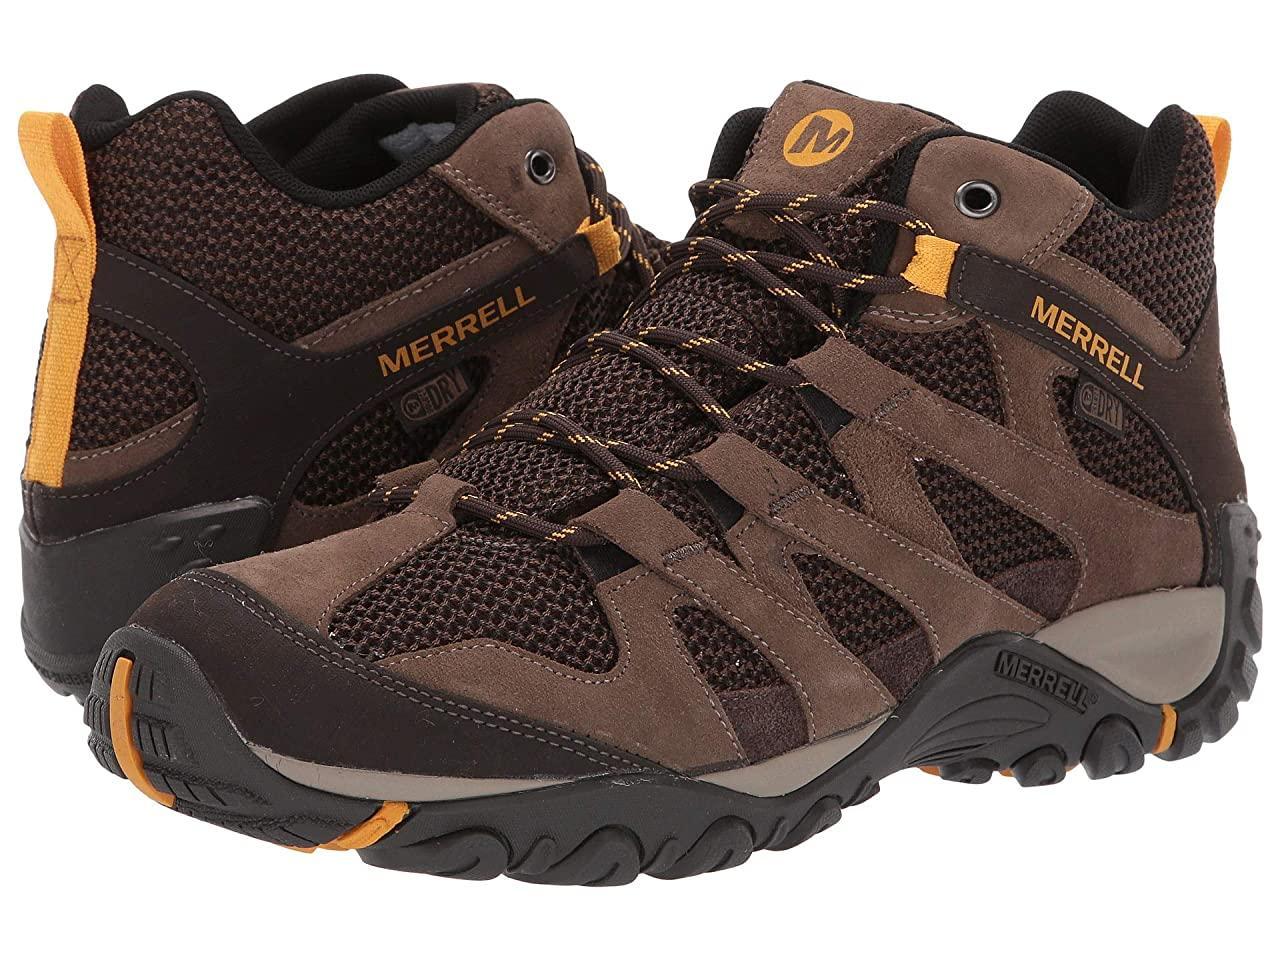 Ботинки/Сапоги (Оригинал) Merrell Alverstone Mid Waterproof Merrell Stone